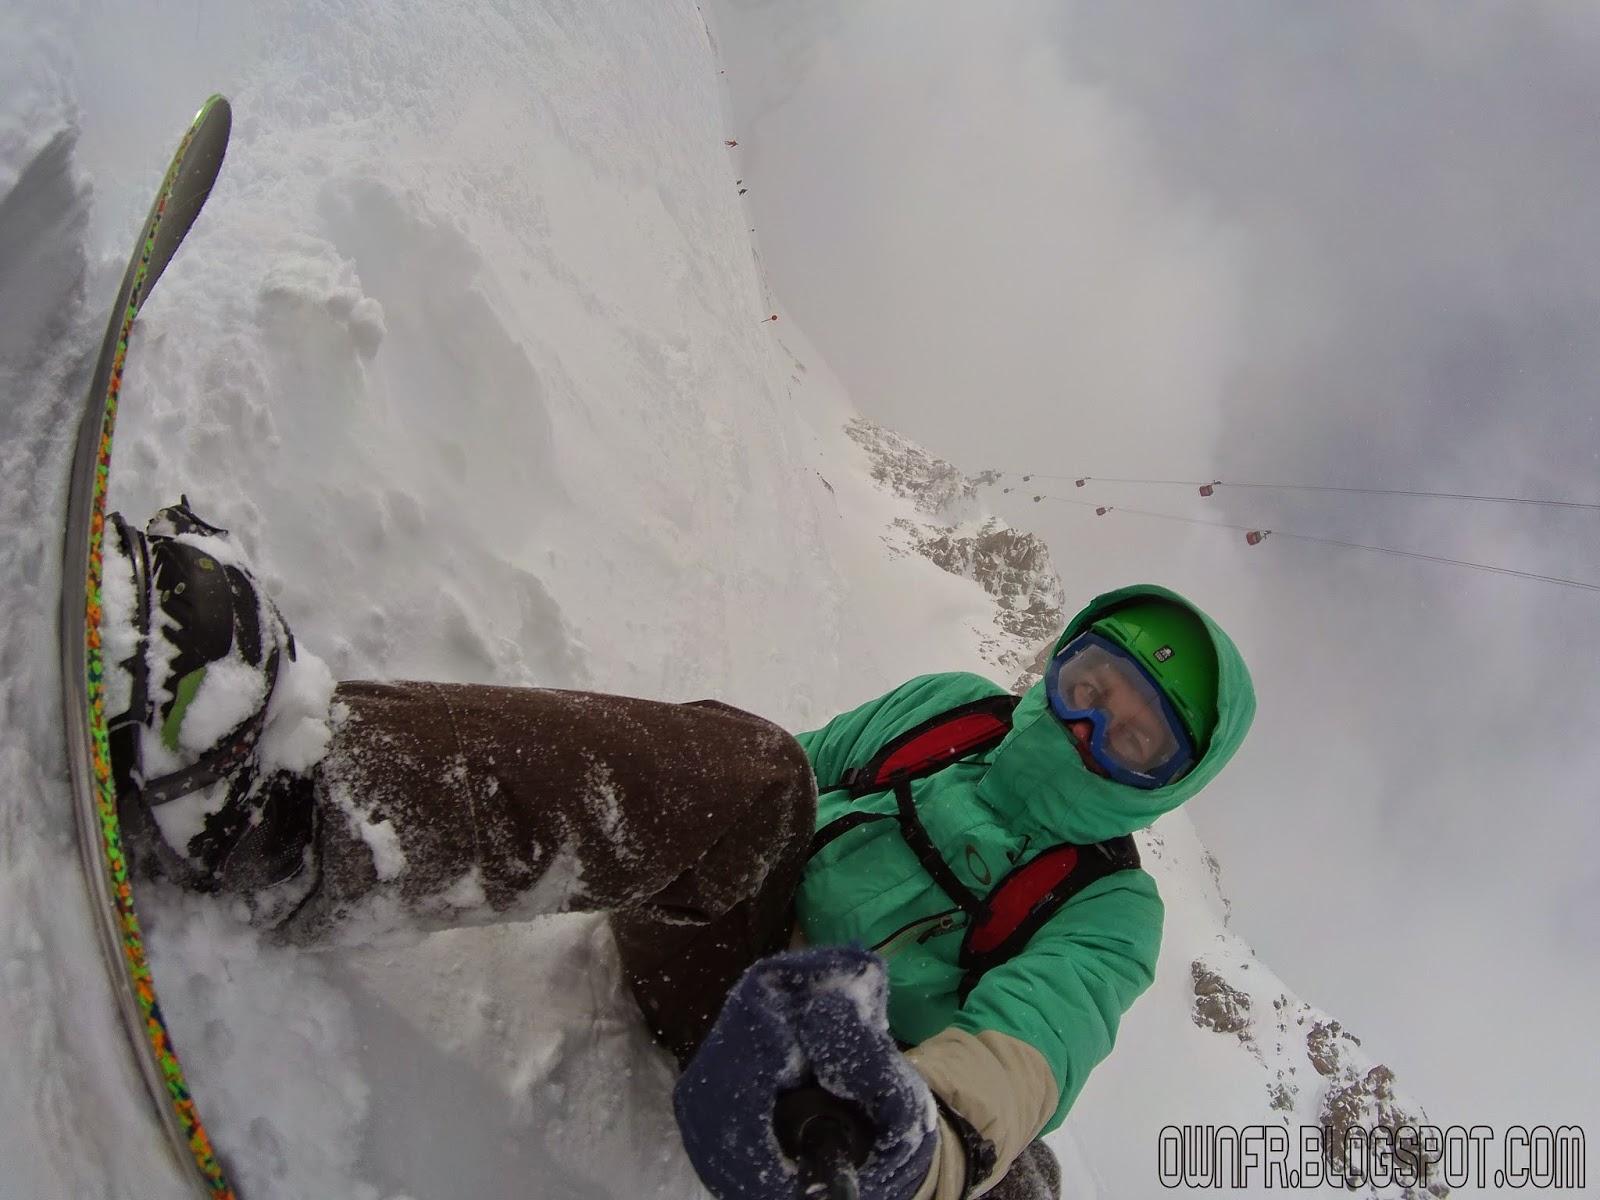 Ownfreeride extreme team na lodowcu Stubaier Gletscher